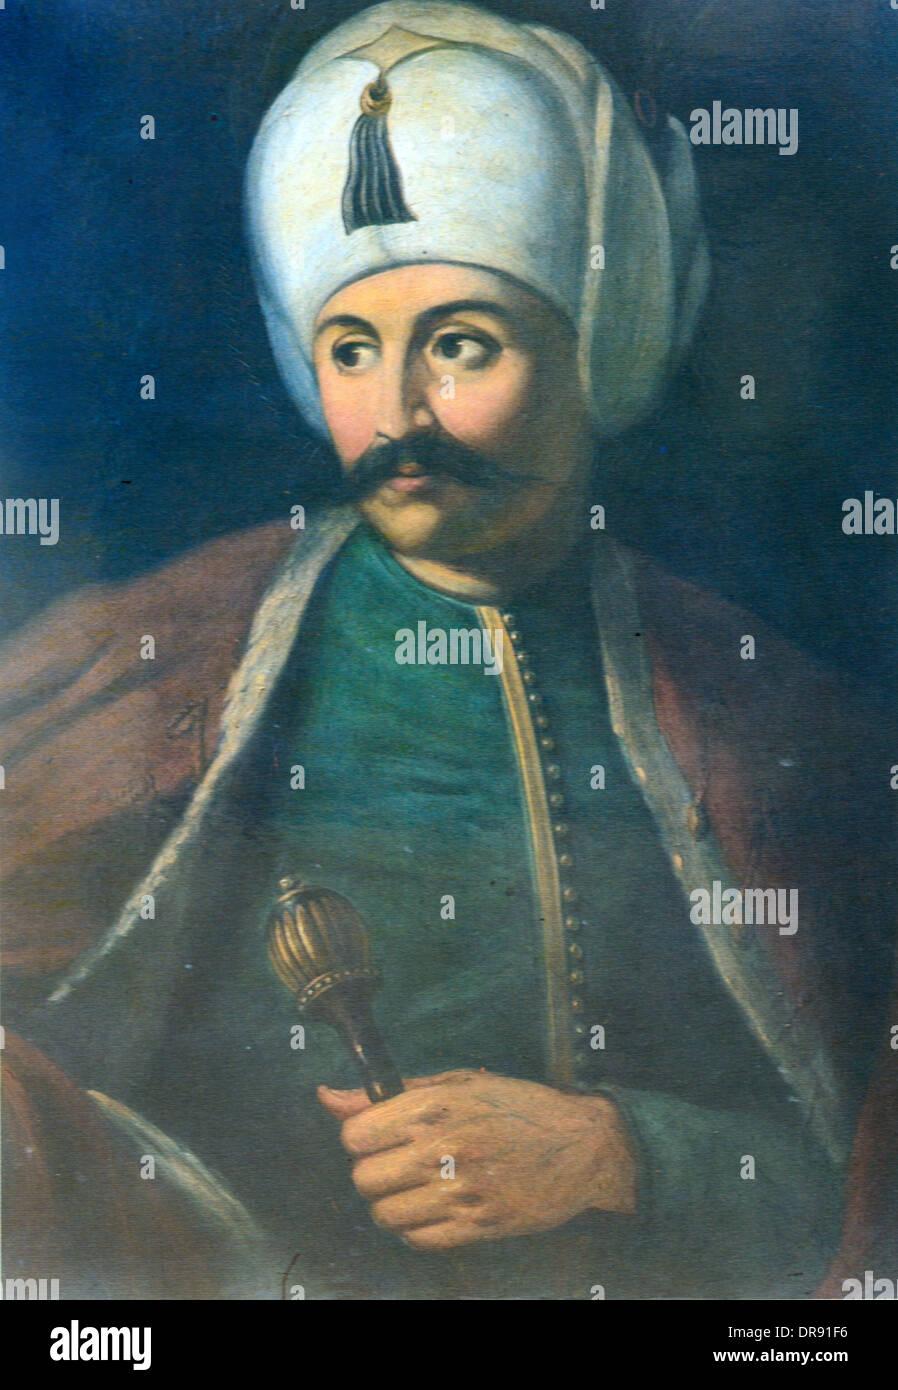 Turkish Ottoman Sultan Selim I (1460s-1530) Portrait - Stock Image